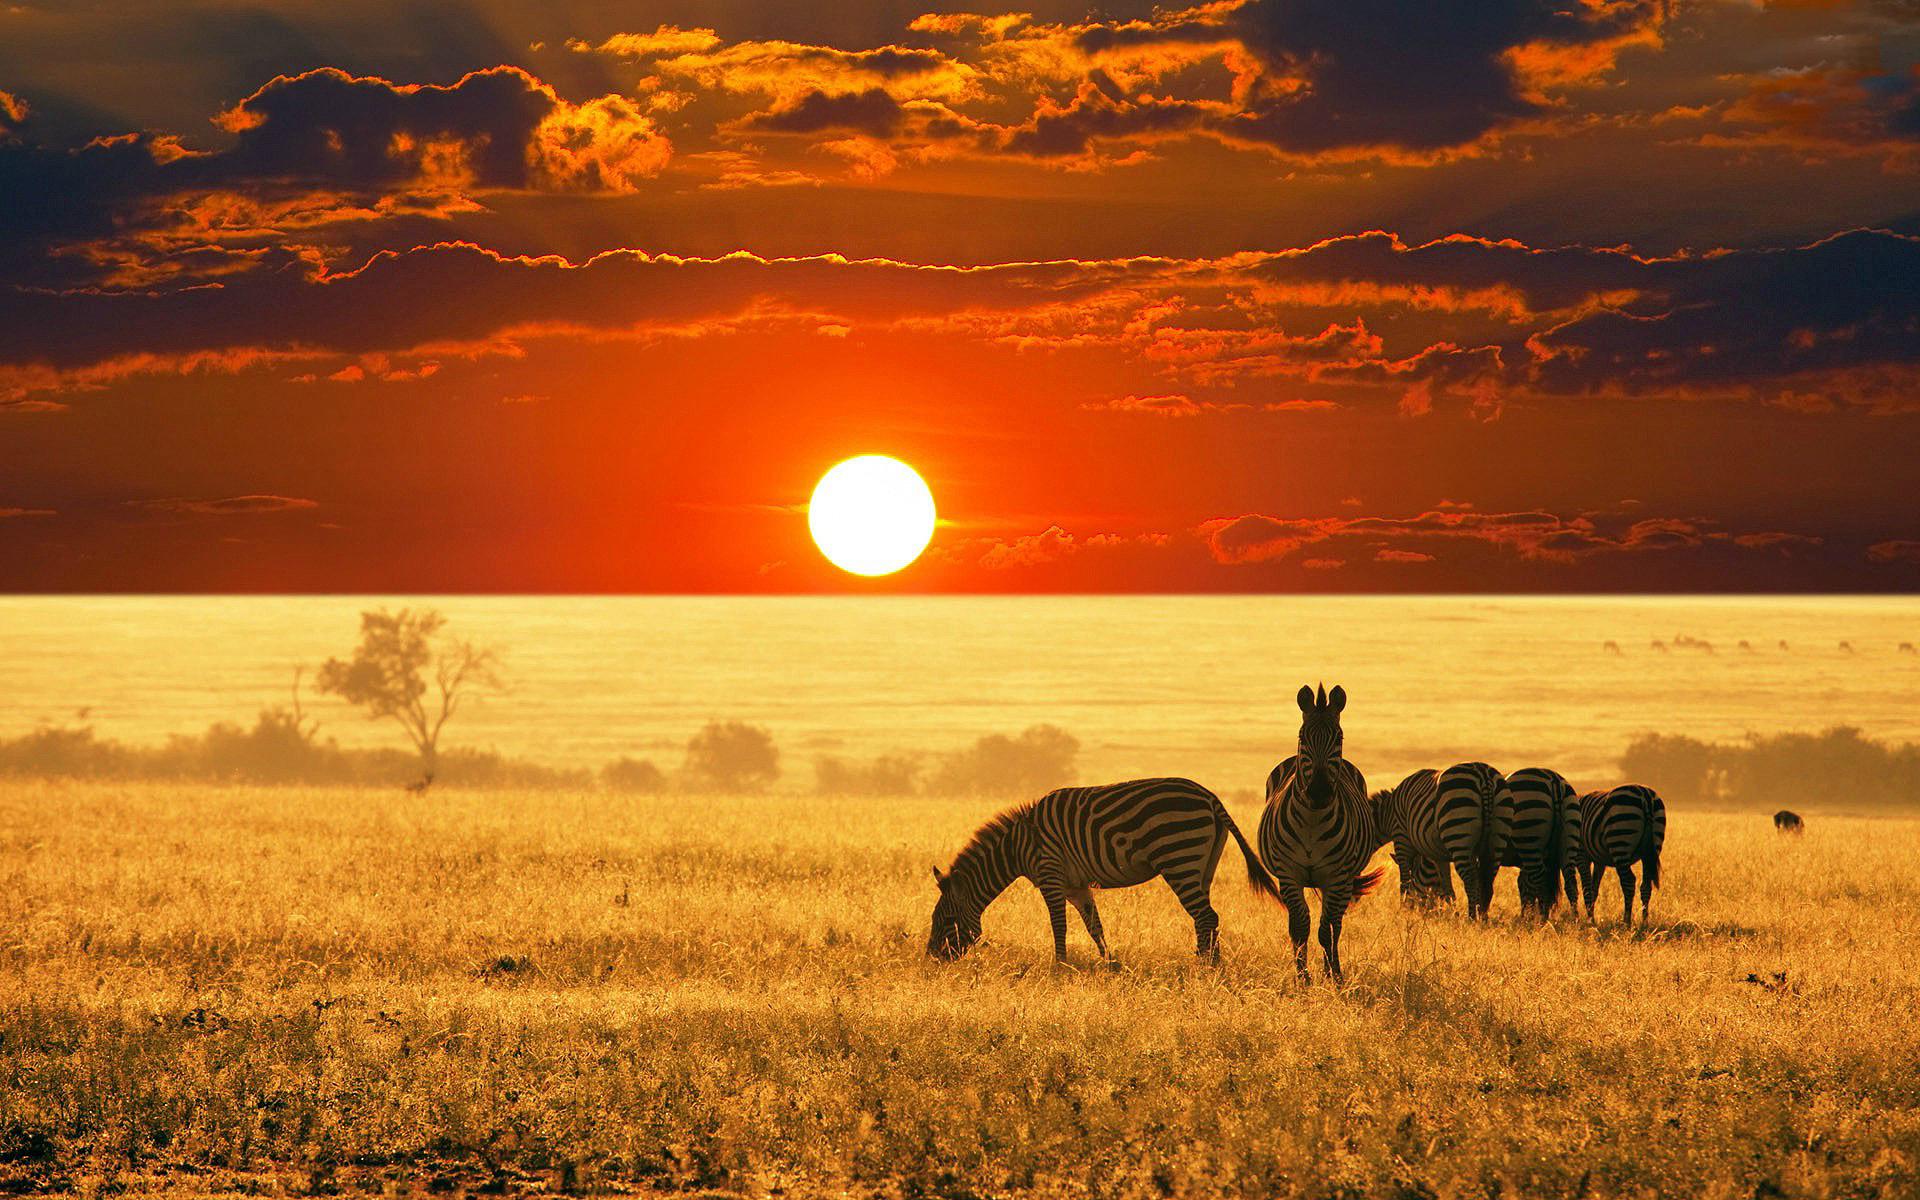 Zebras Sunrise Africa